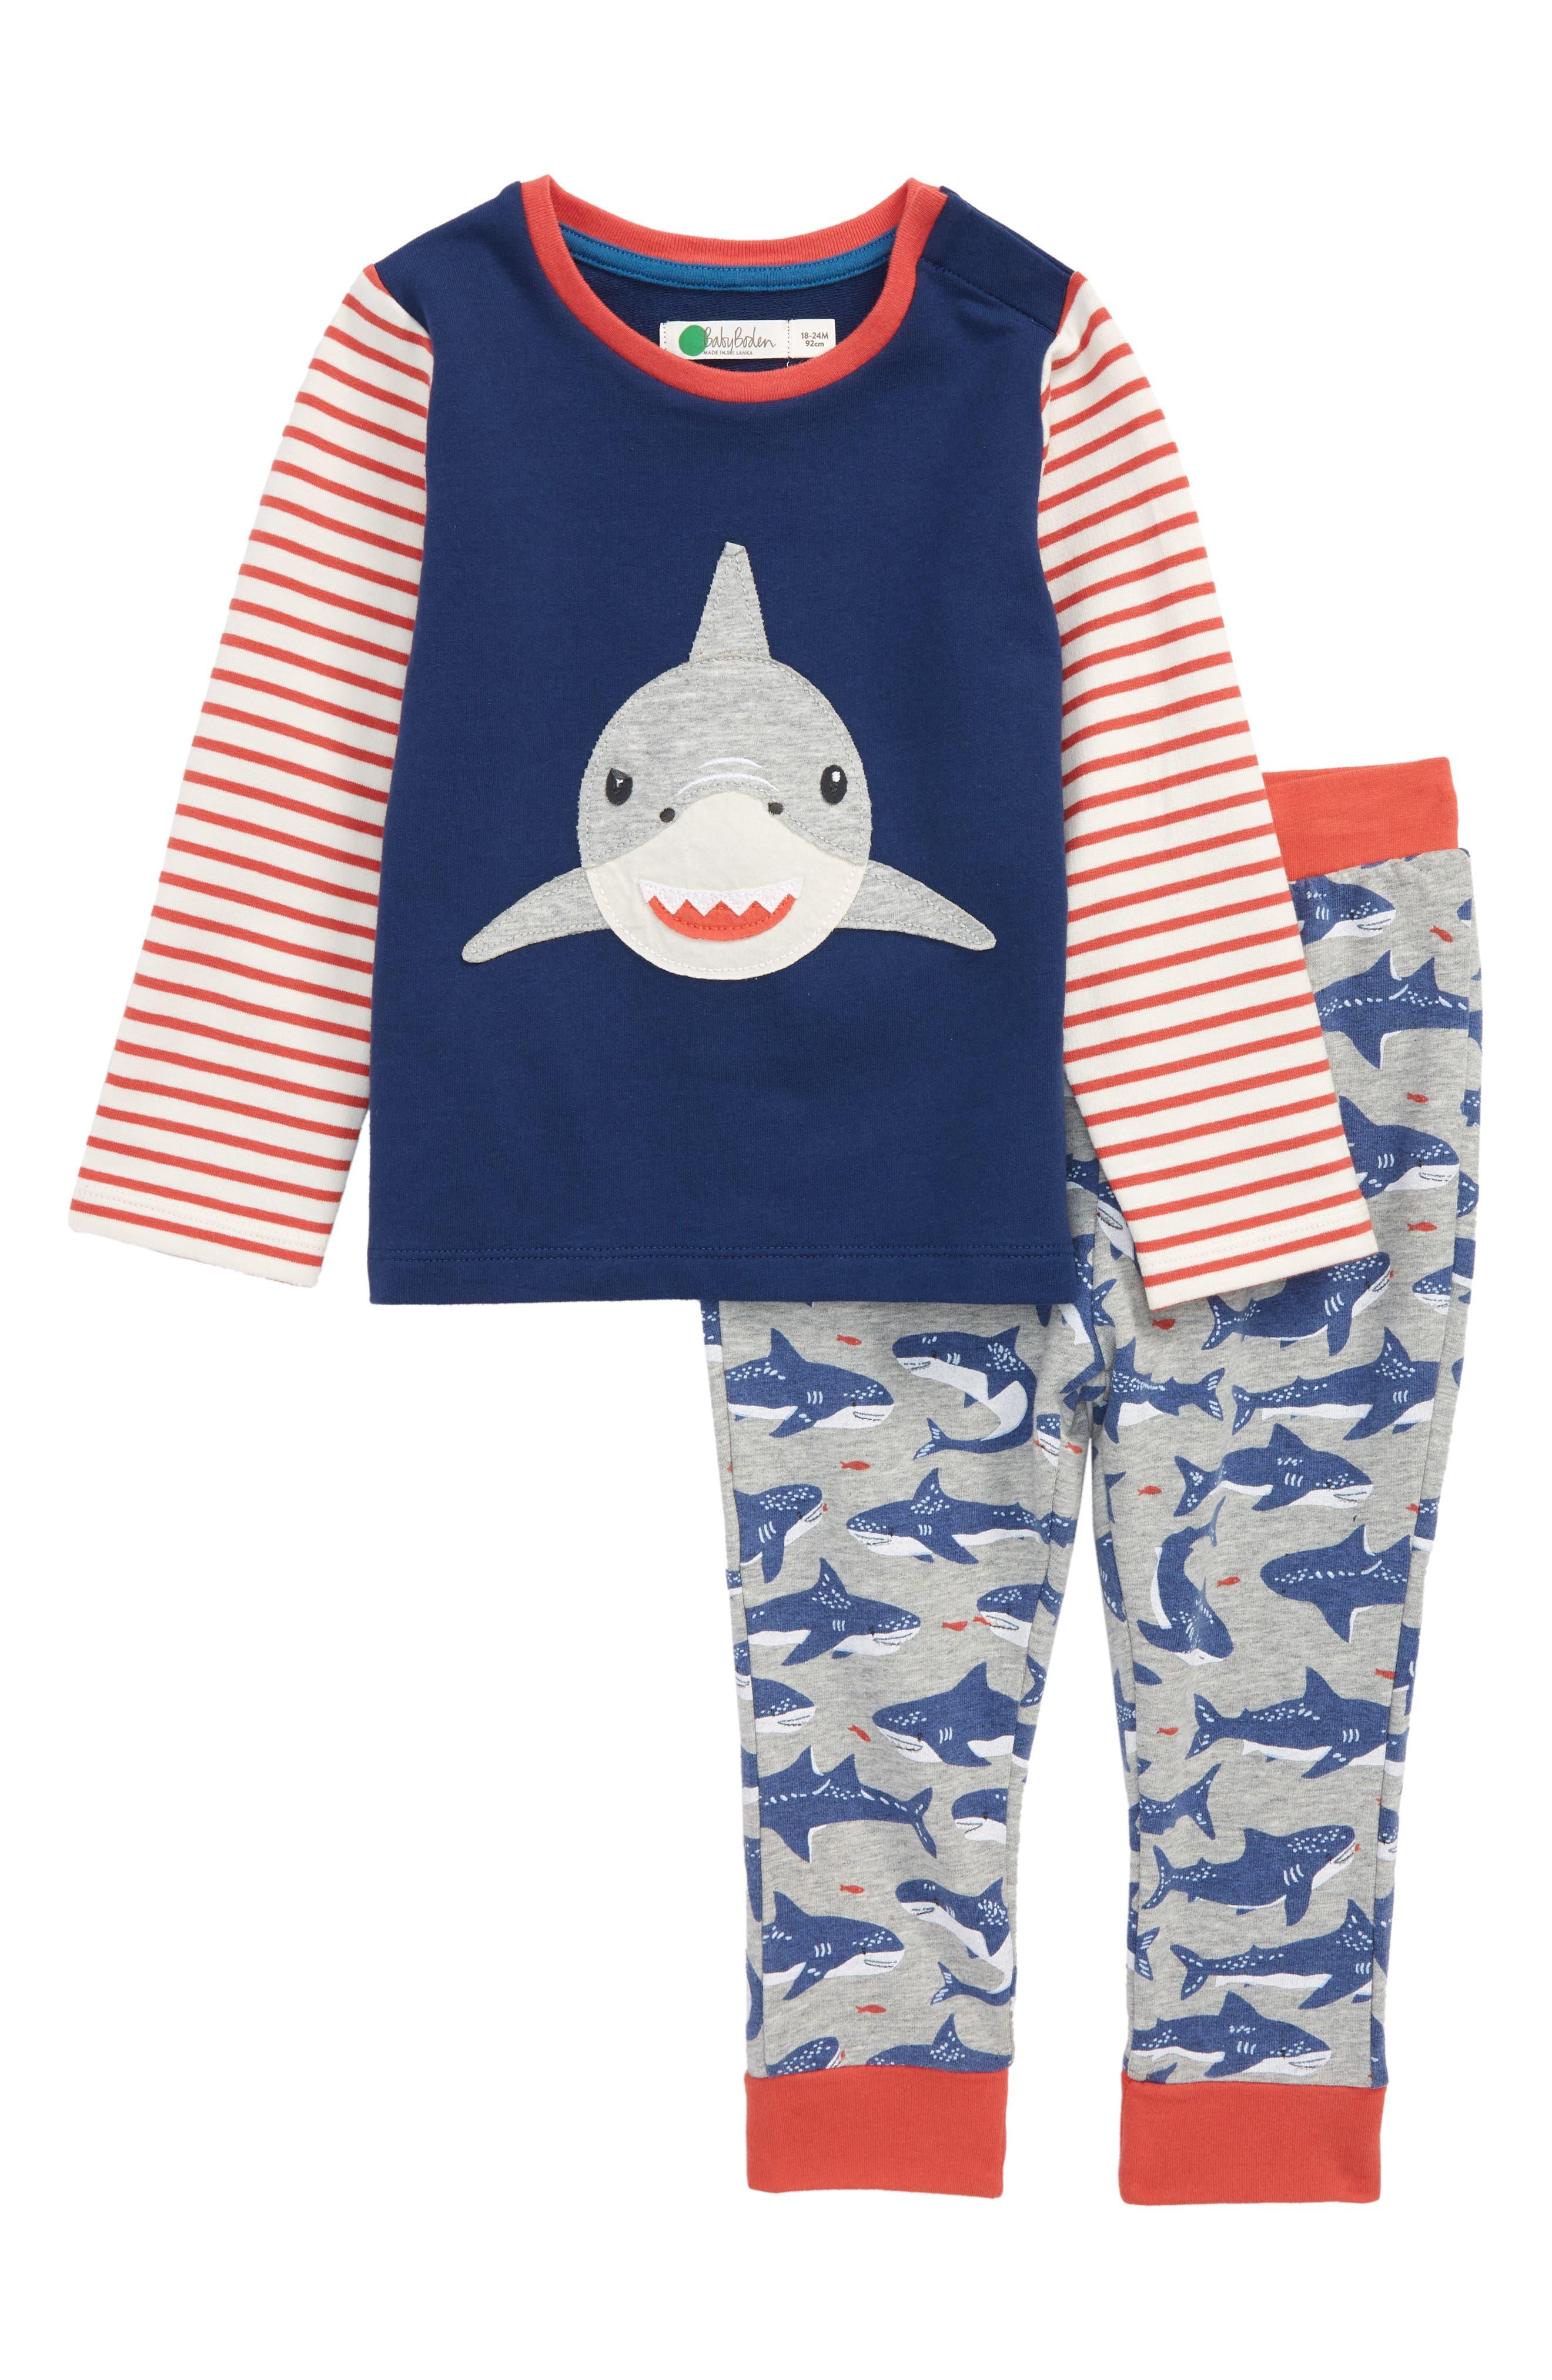 Fun Shark Appliqué Jersey Shirt & Pants Set,                             Main thumbnail 1, color,                             Beacon Blue Shark